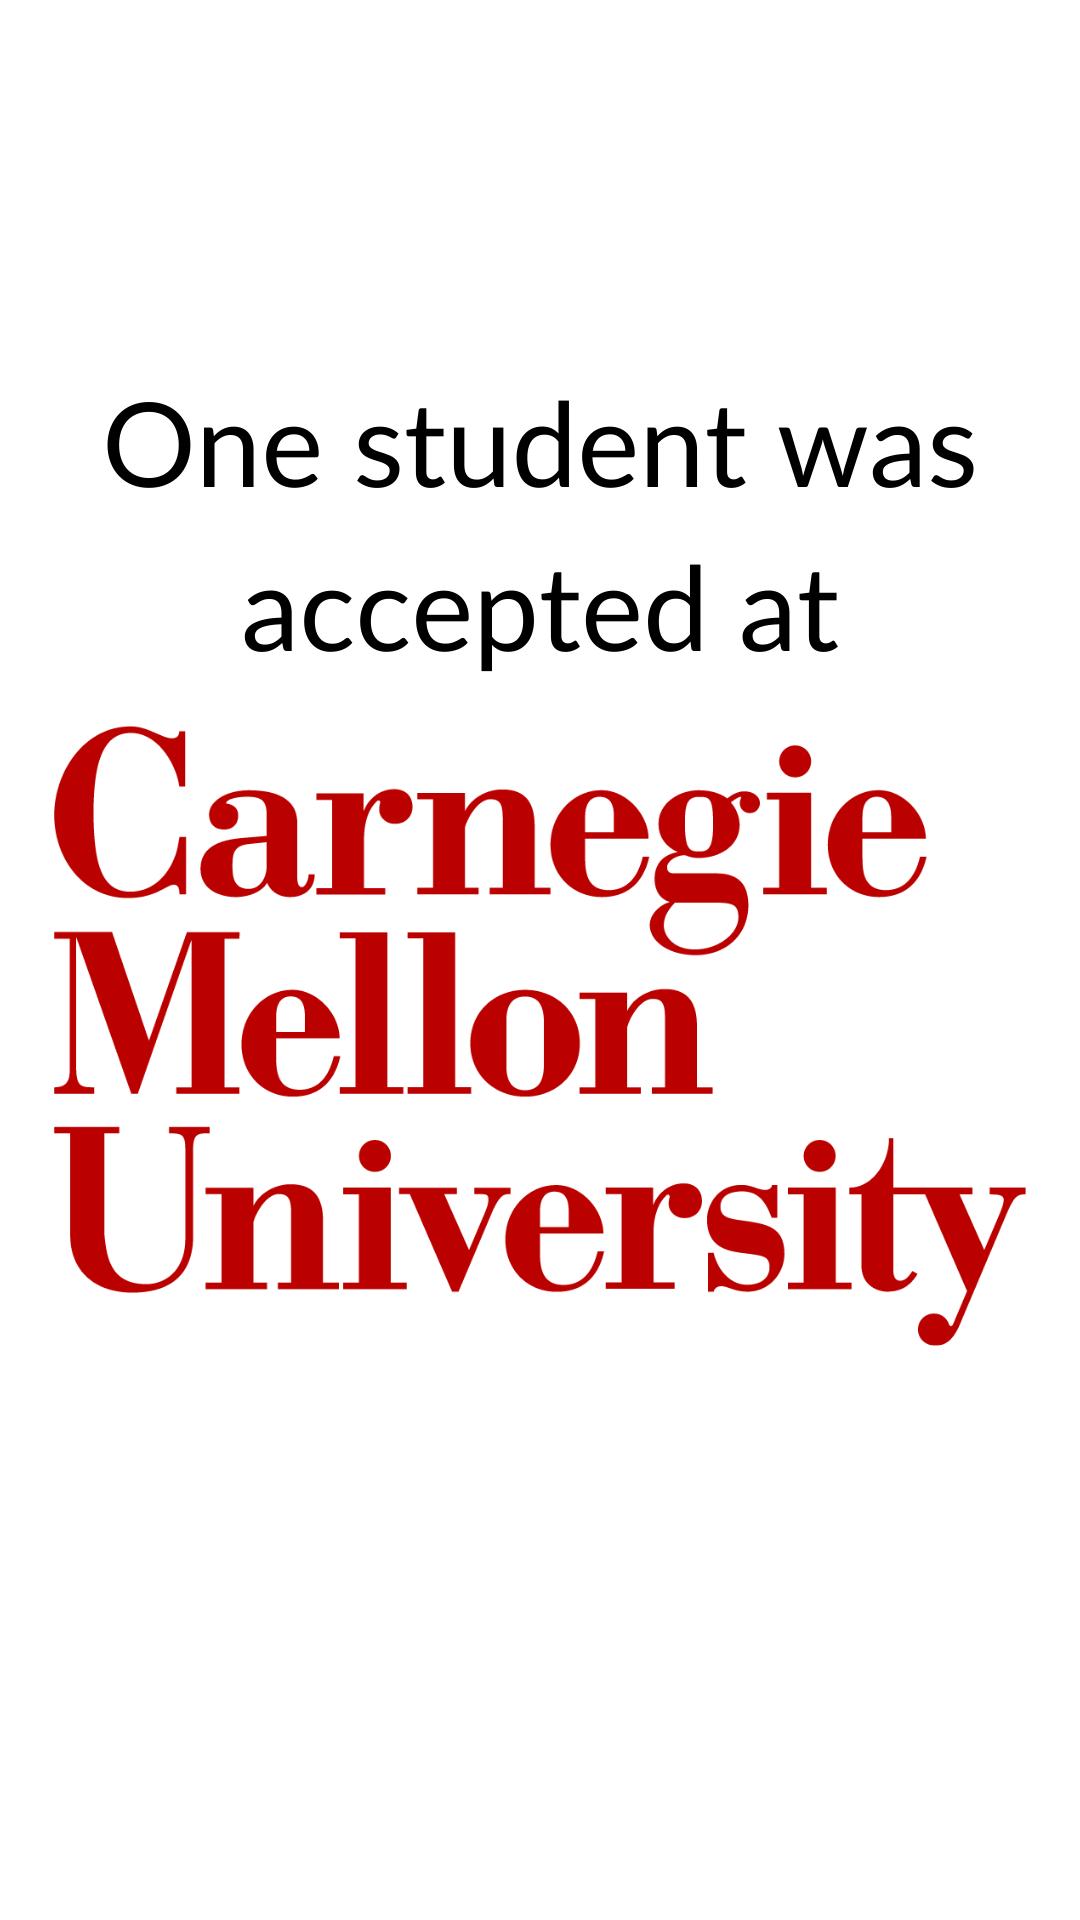 Carnegie Mellon University Acceptance in 2020 School